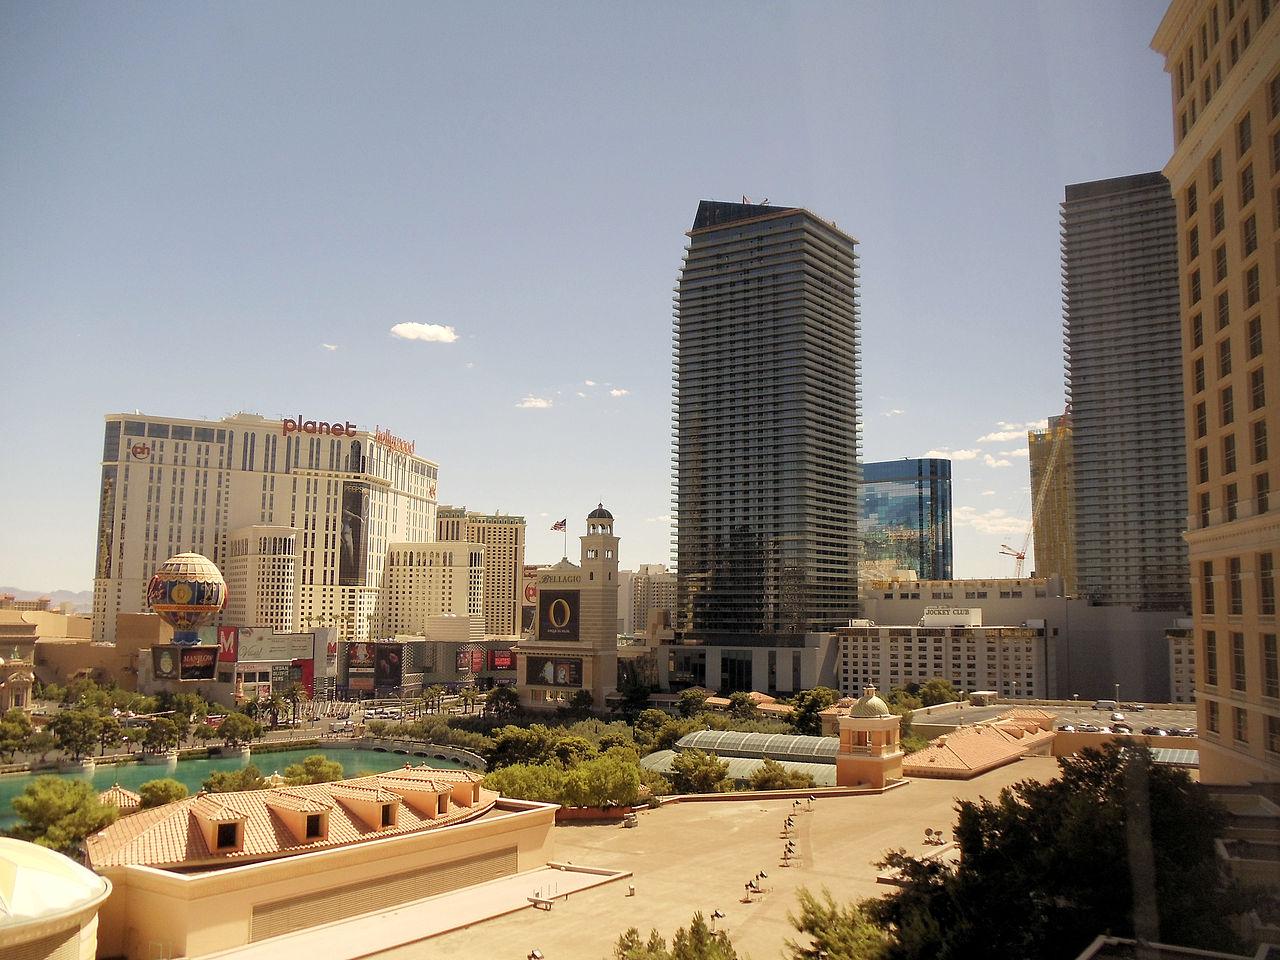 planet hollywood casino las vegas wikipedia